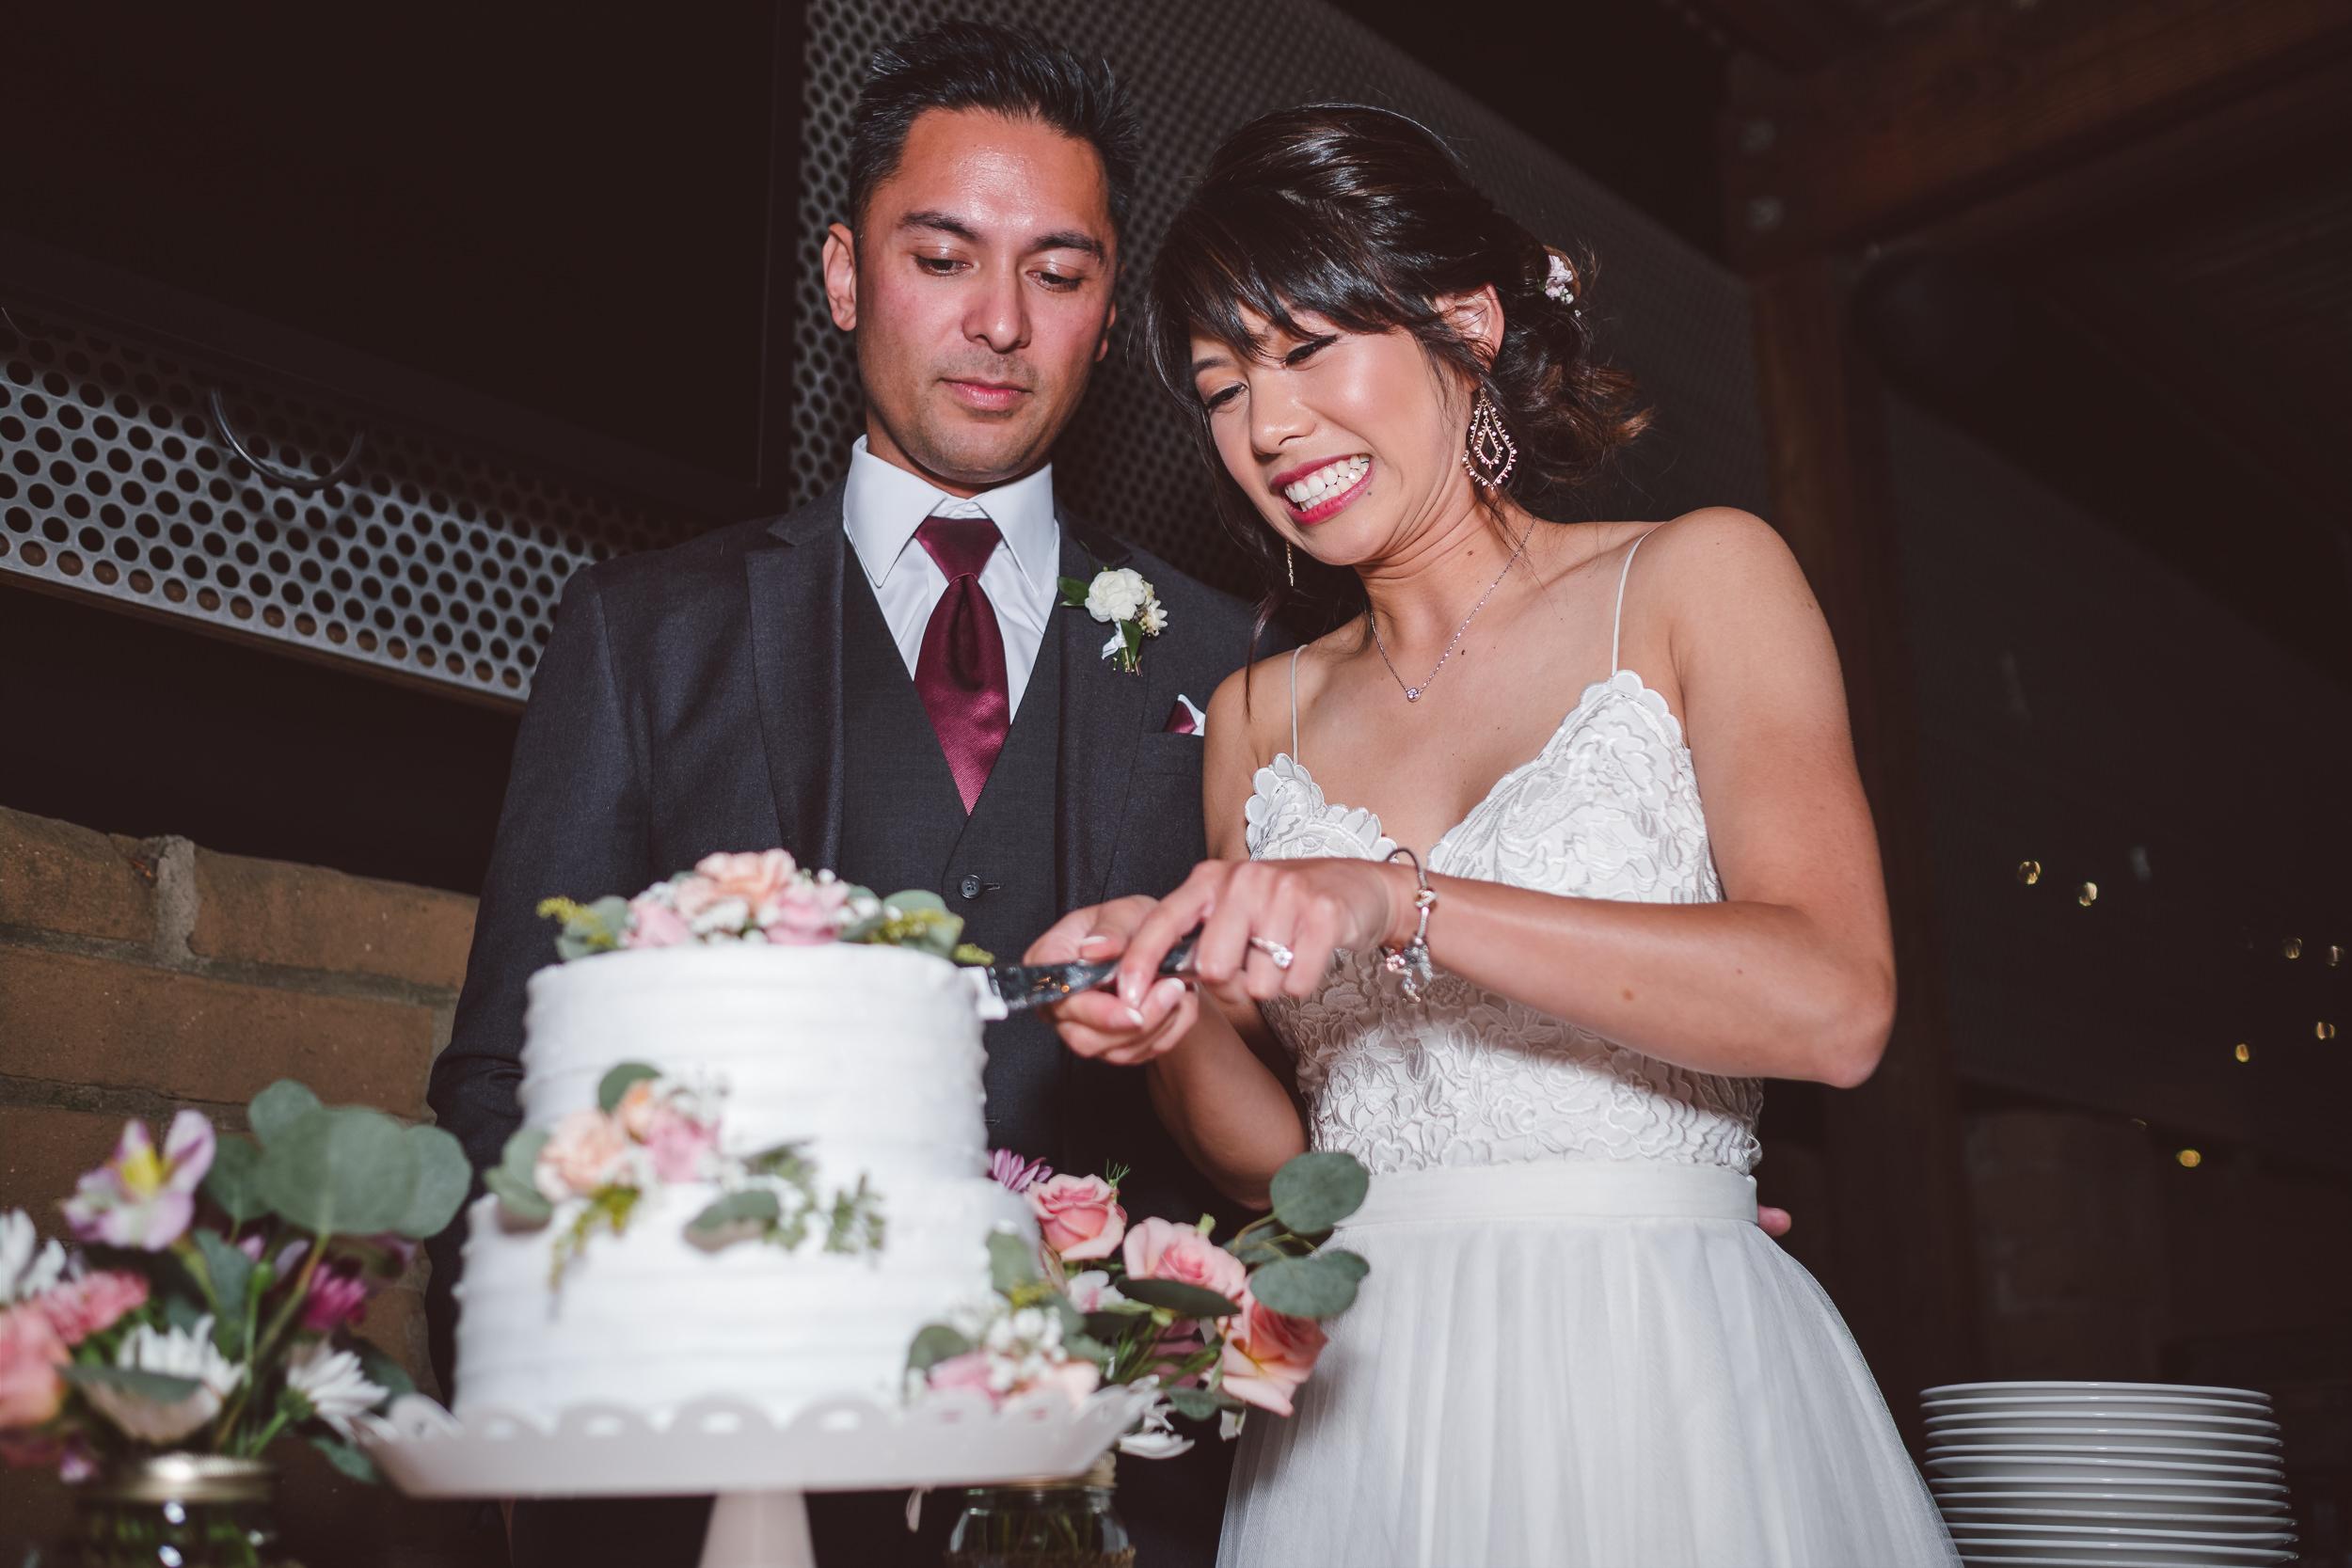 San-Francisco-City-Hall-Wedding-Photography-090.jpg